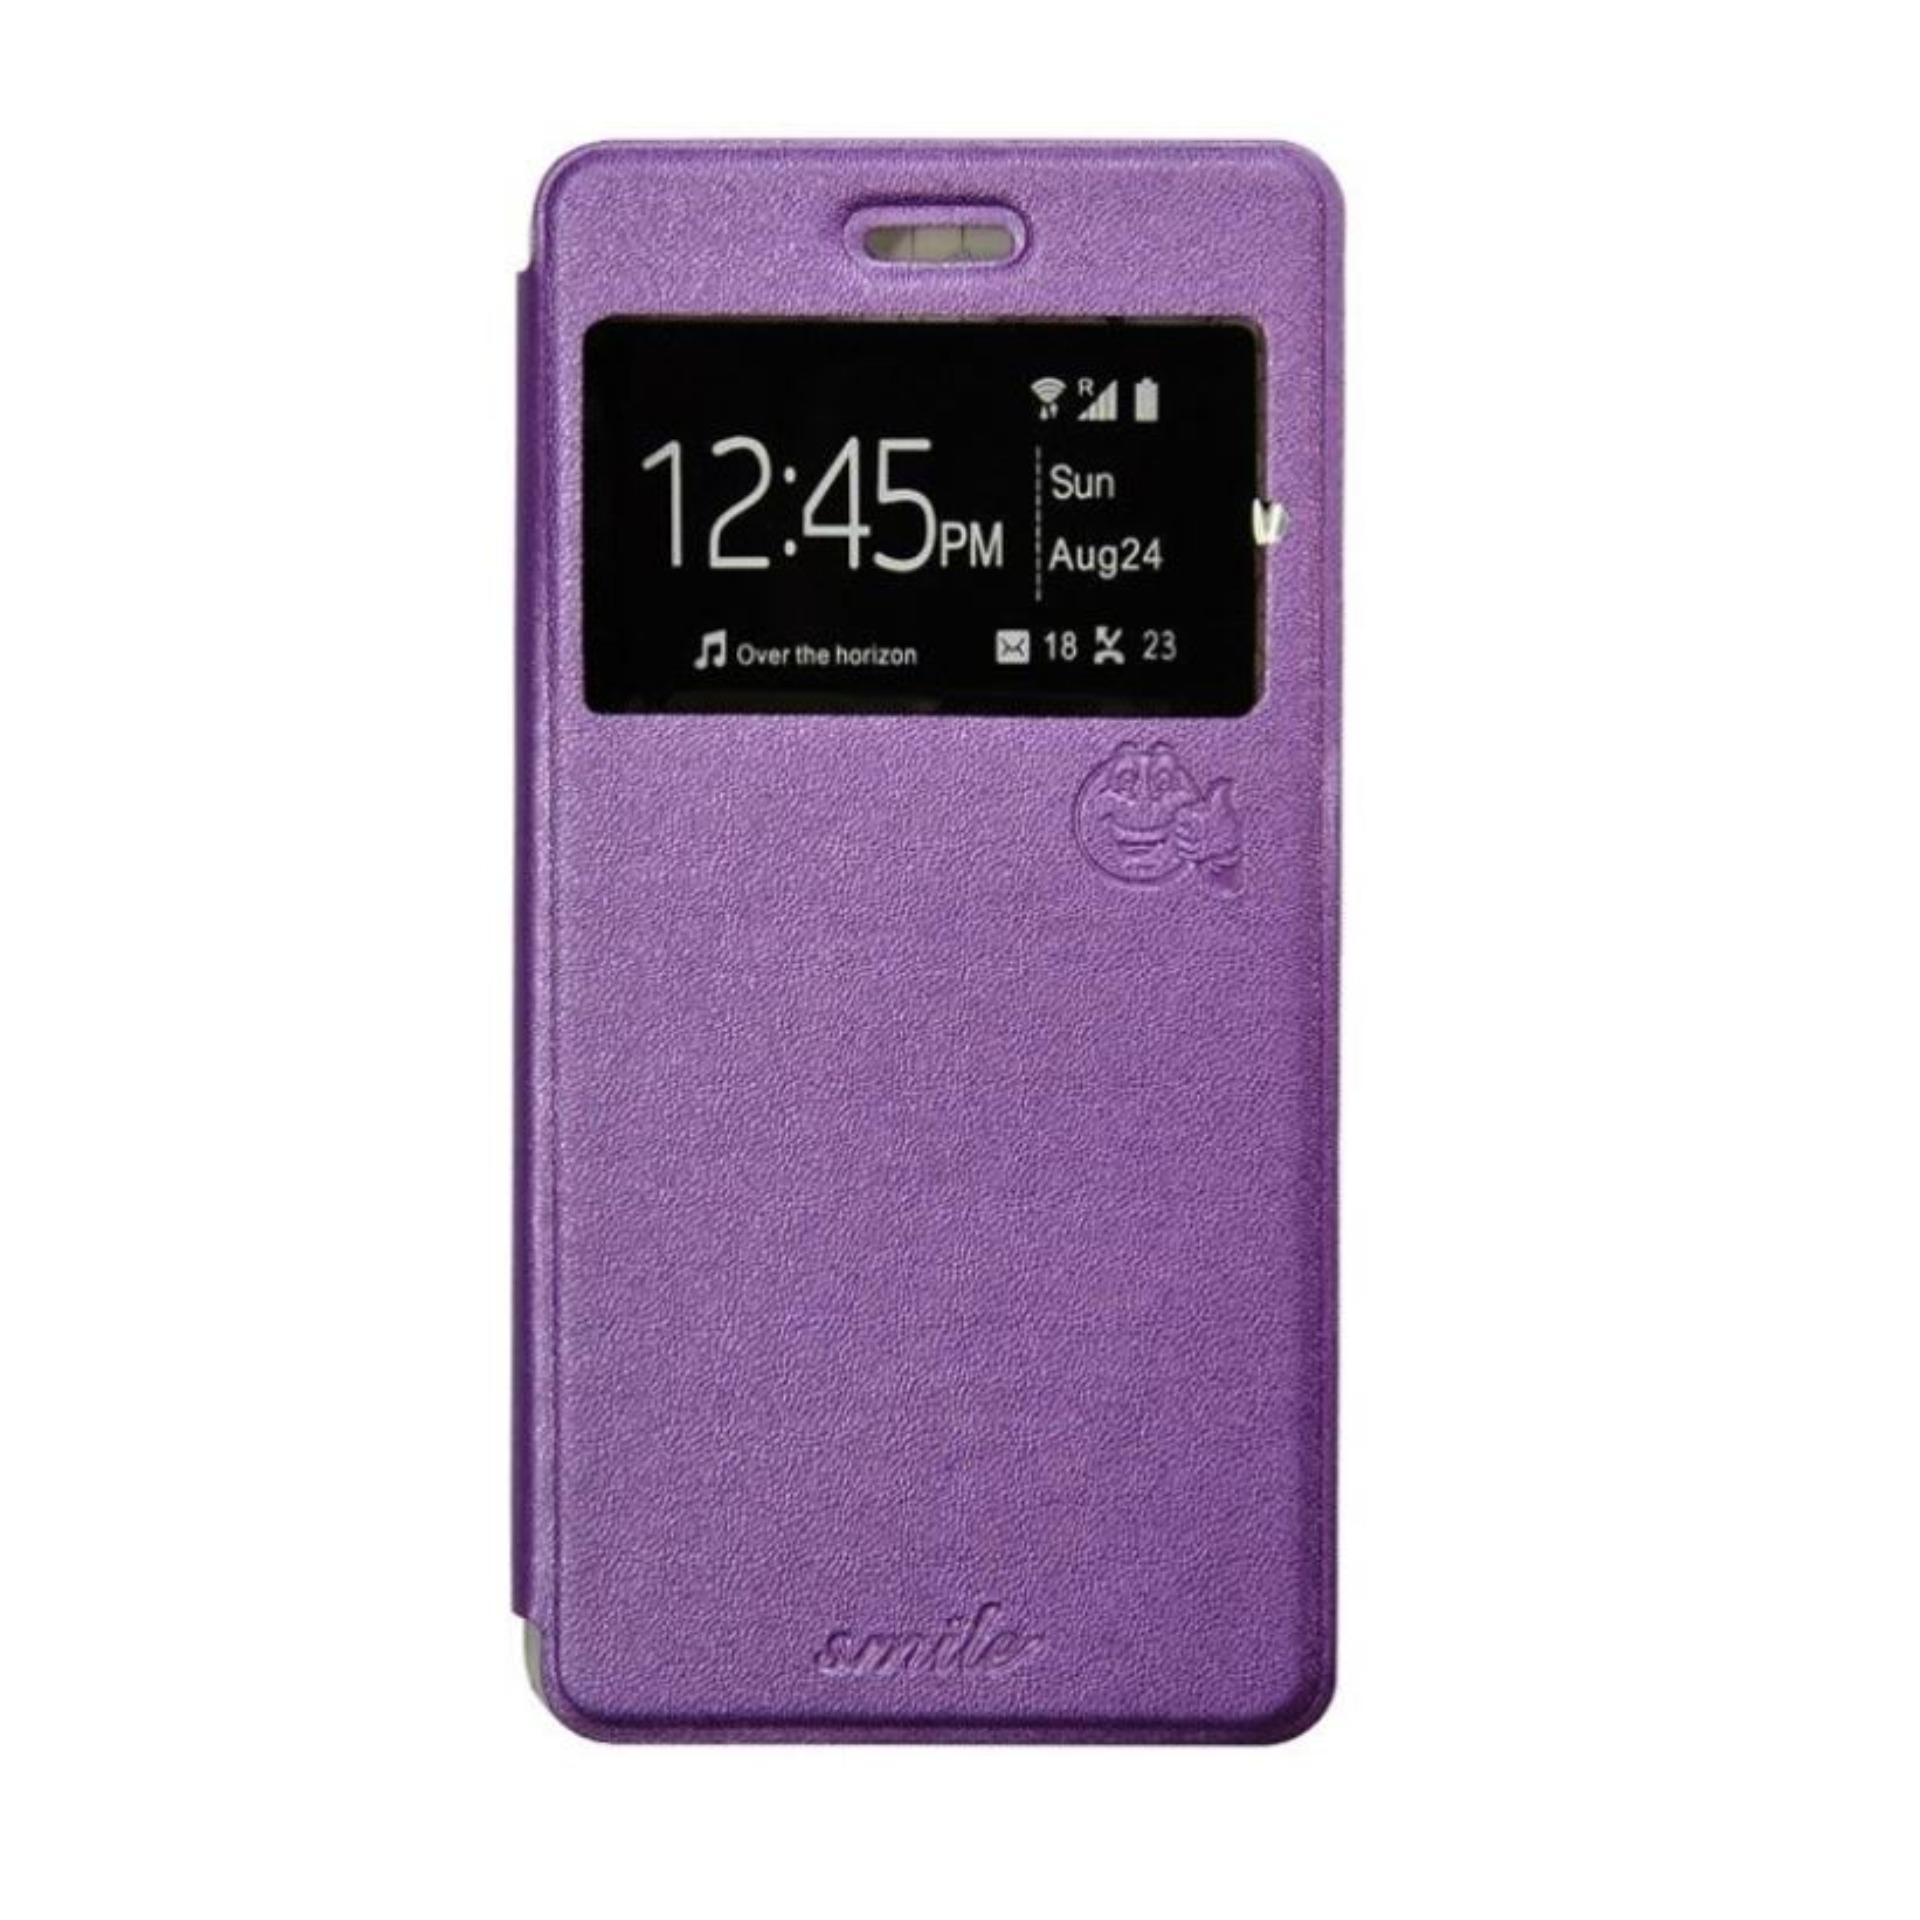 Aldora Case For Asus Zenfone 3 Max (5.5) / ZC553KL Flip Cover Case Dengan Pelindung Layar Smile Ser